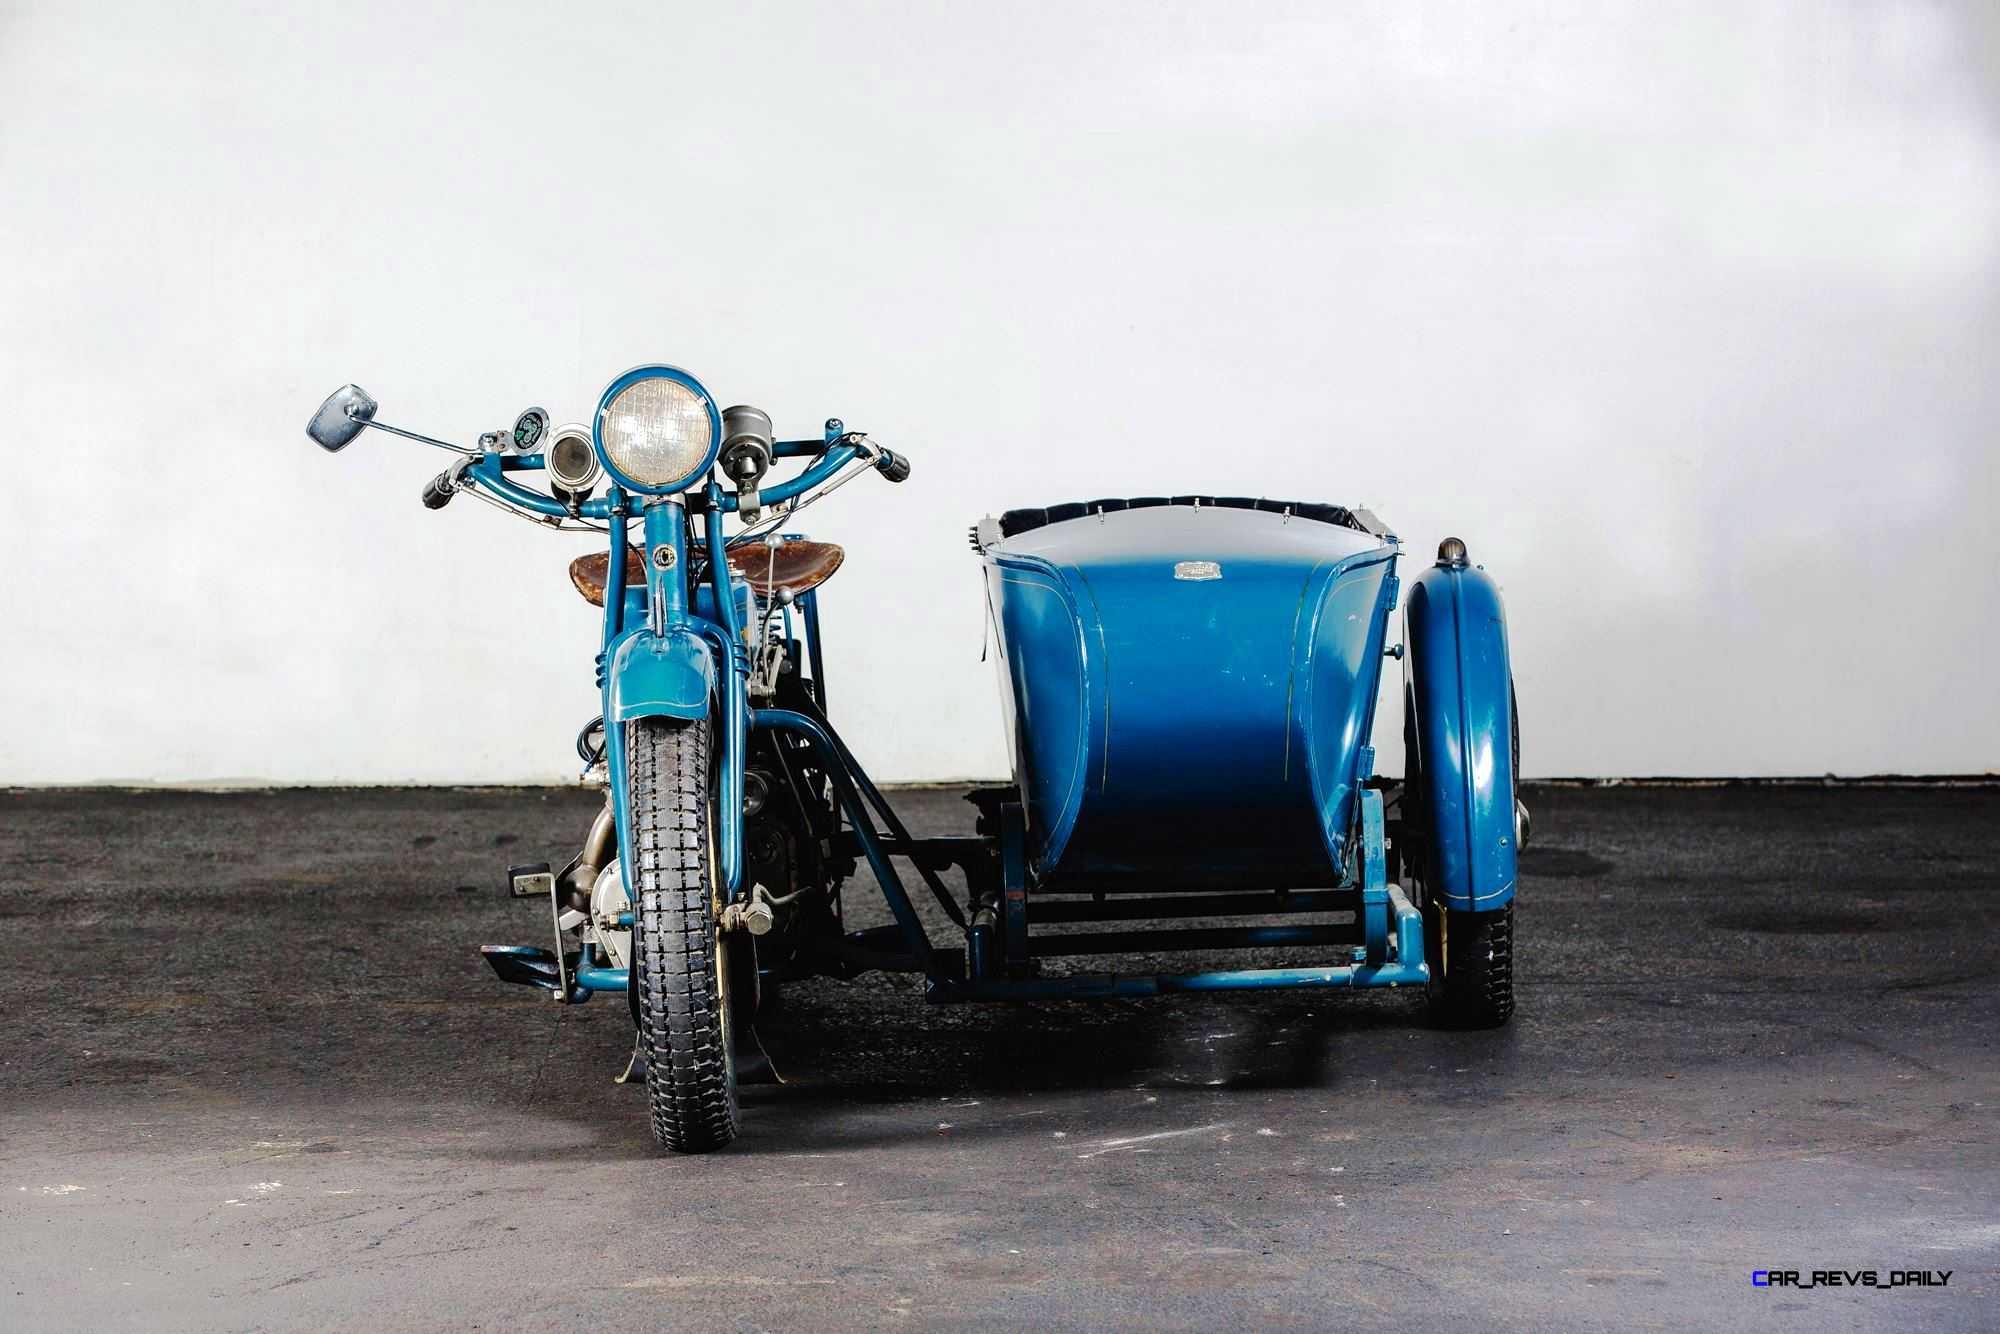 1925-Henderson-De-Luxe-with-Goulding-Sidecar-17.jpg